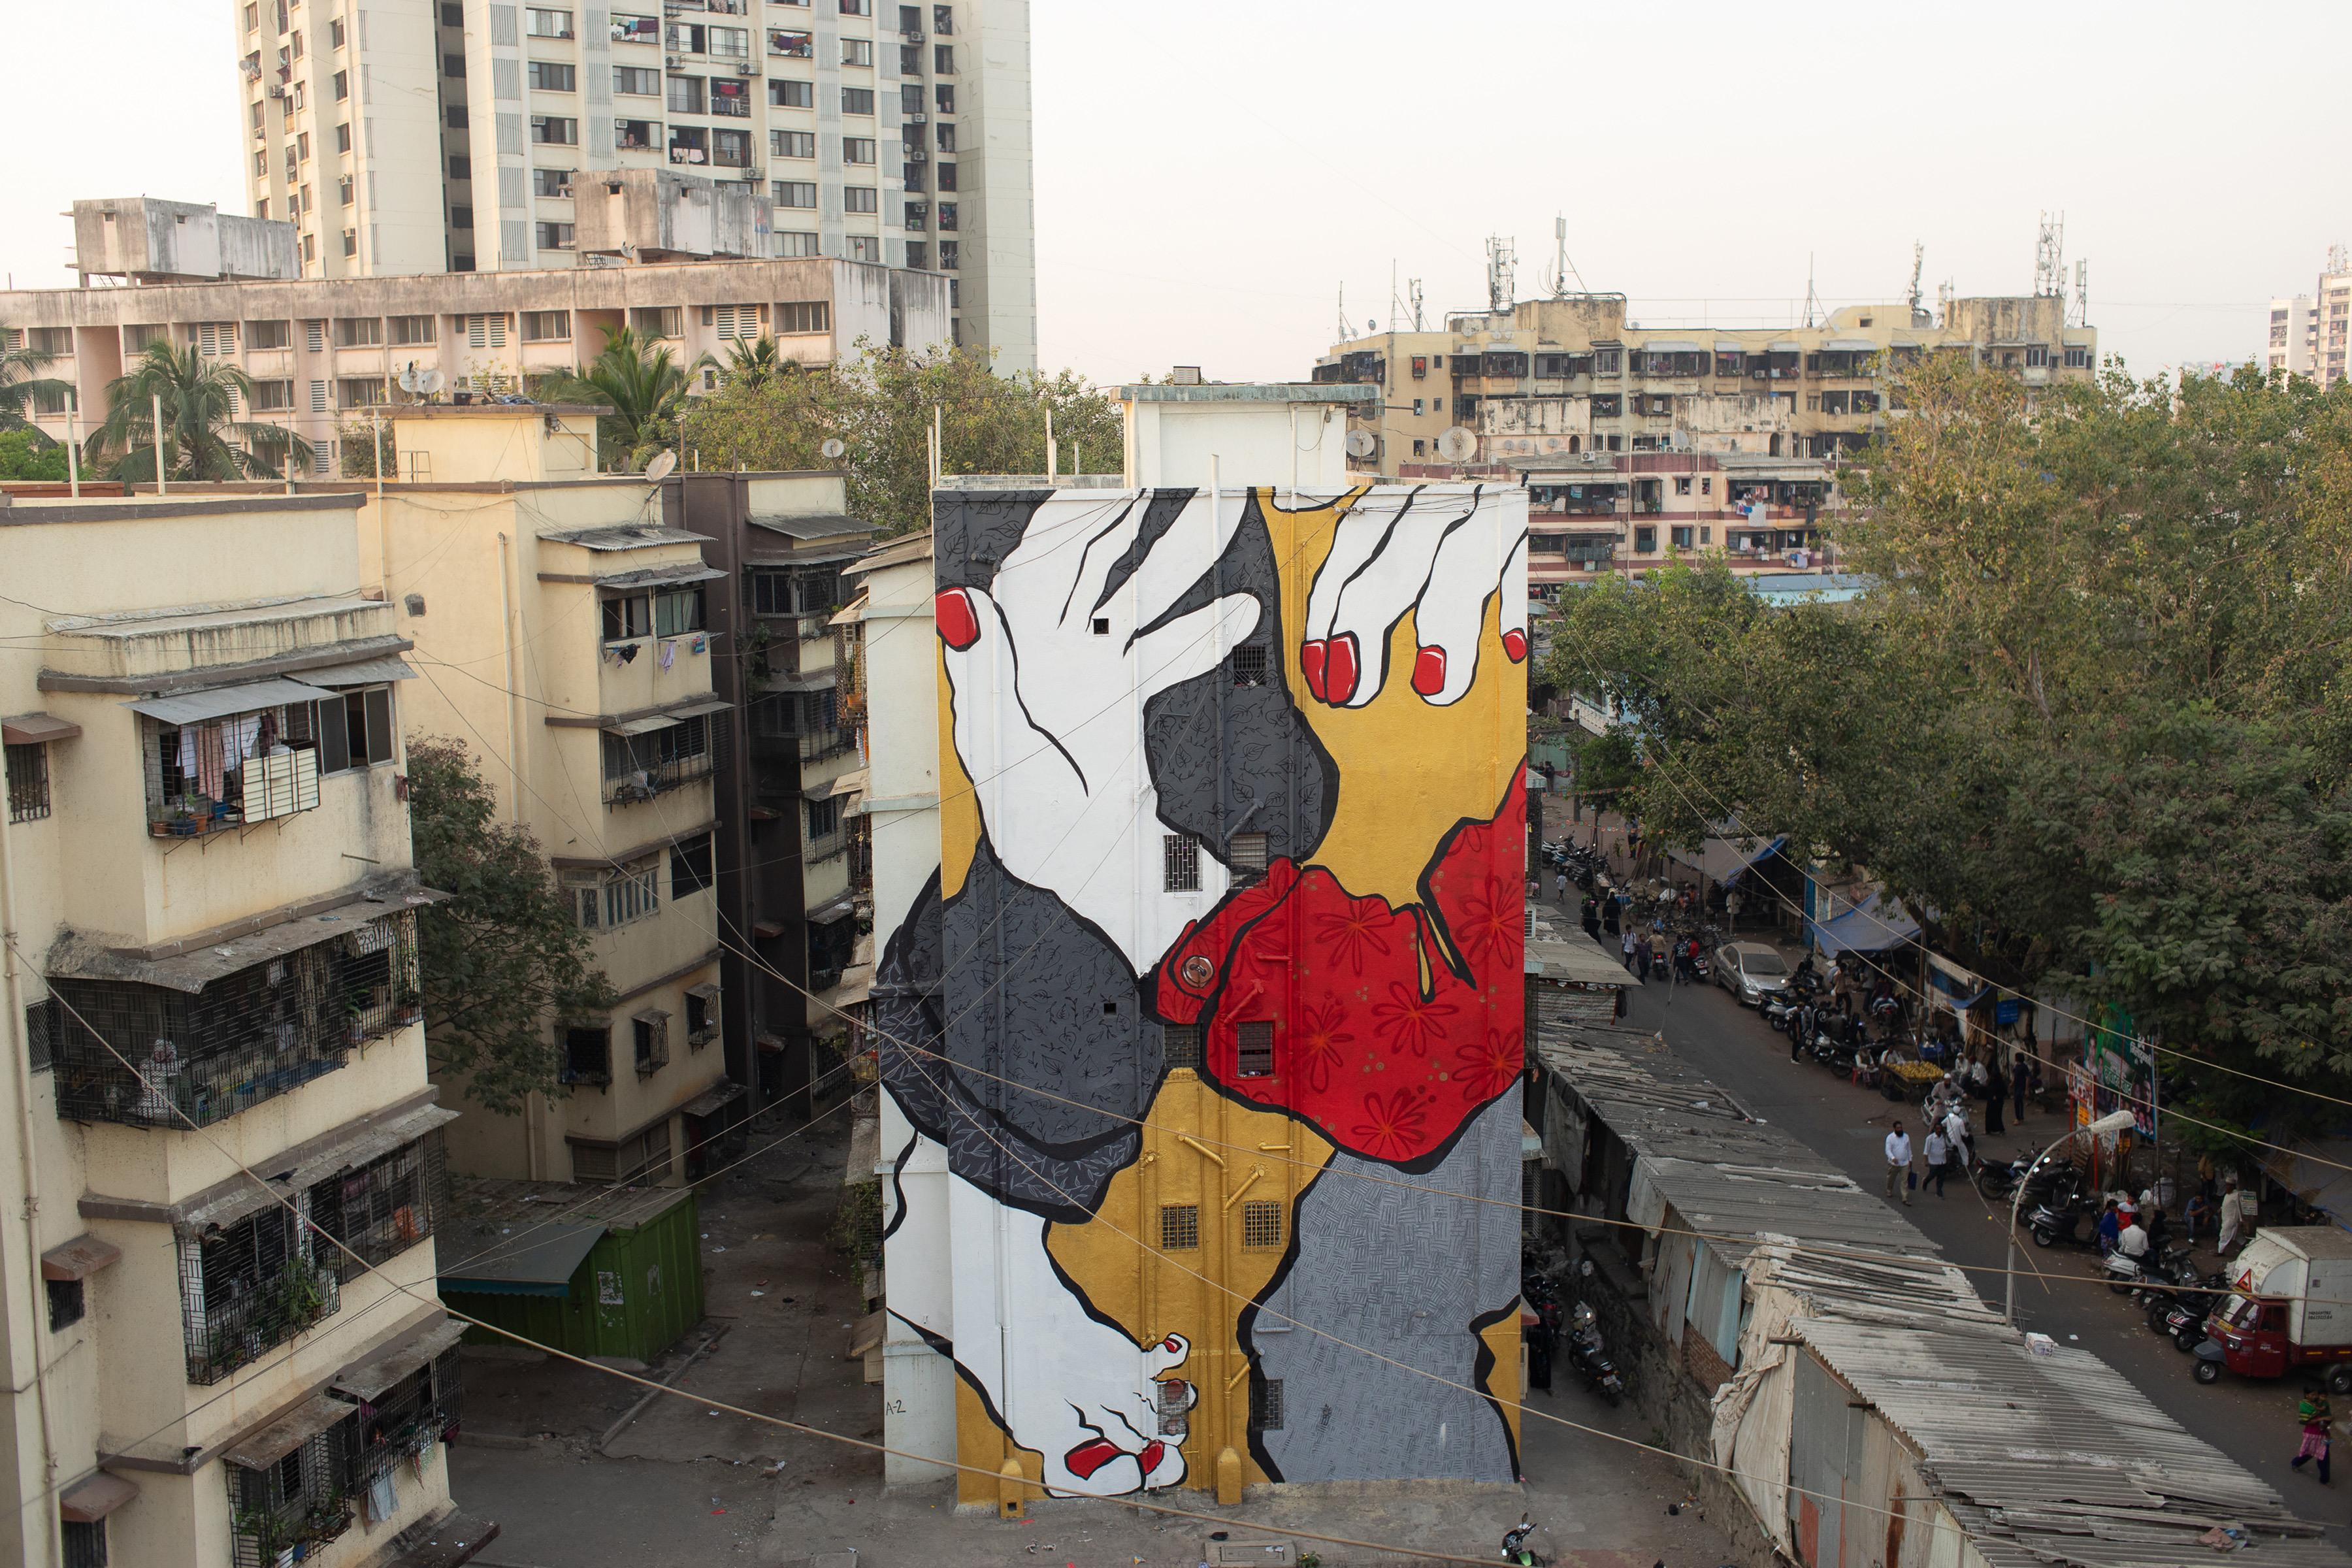 Ella Pitr Reveals Mahim E Art Dist St Art Mumbai 2018 2